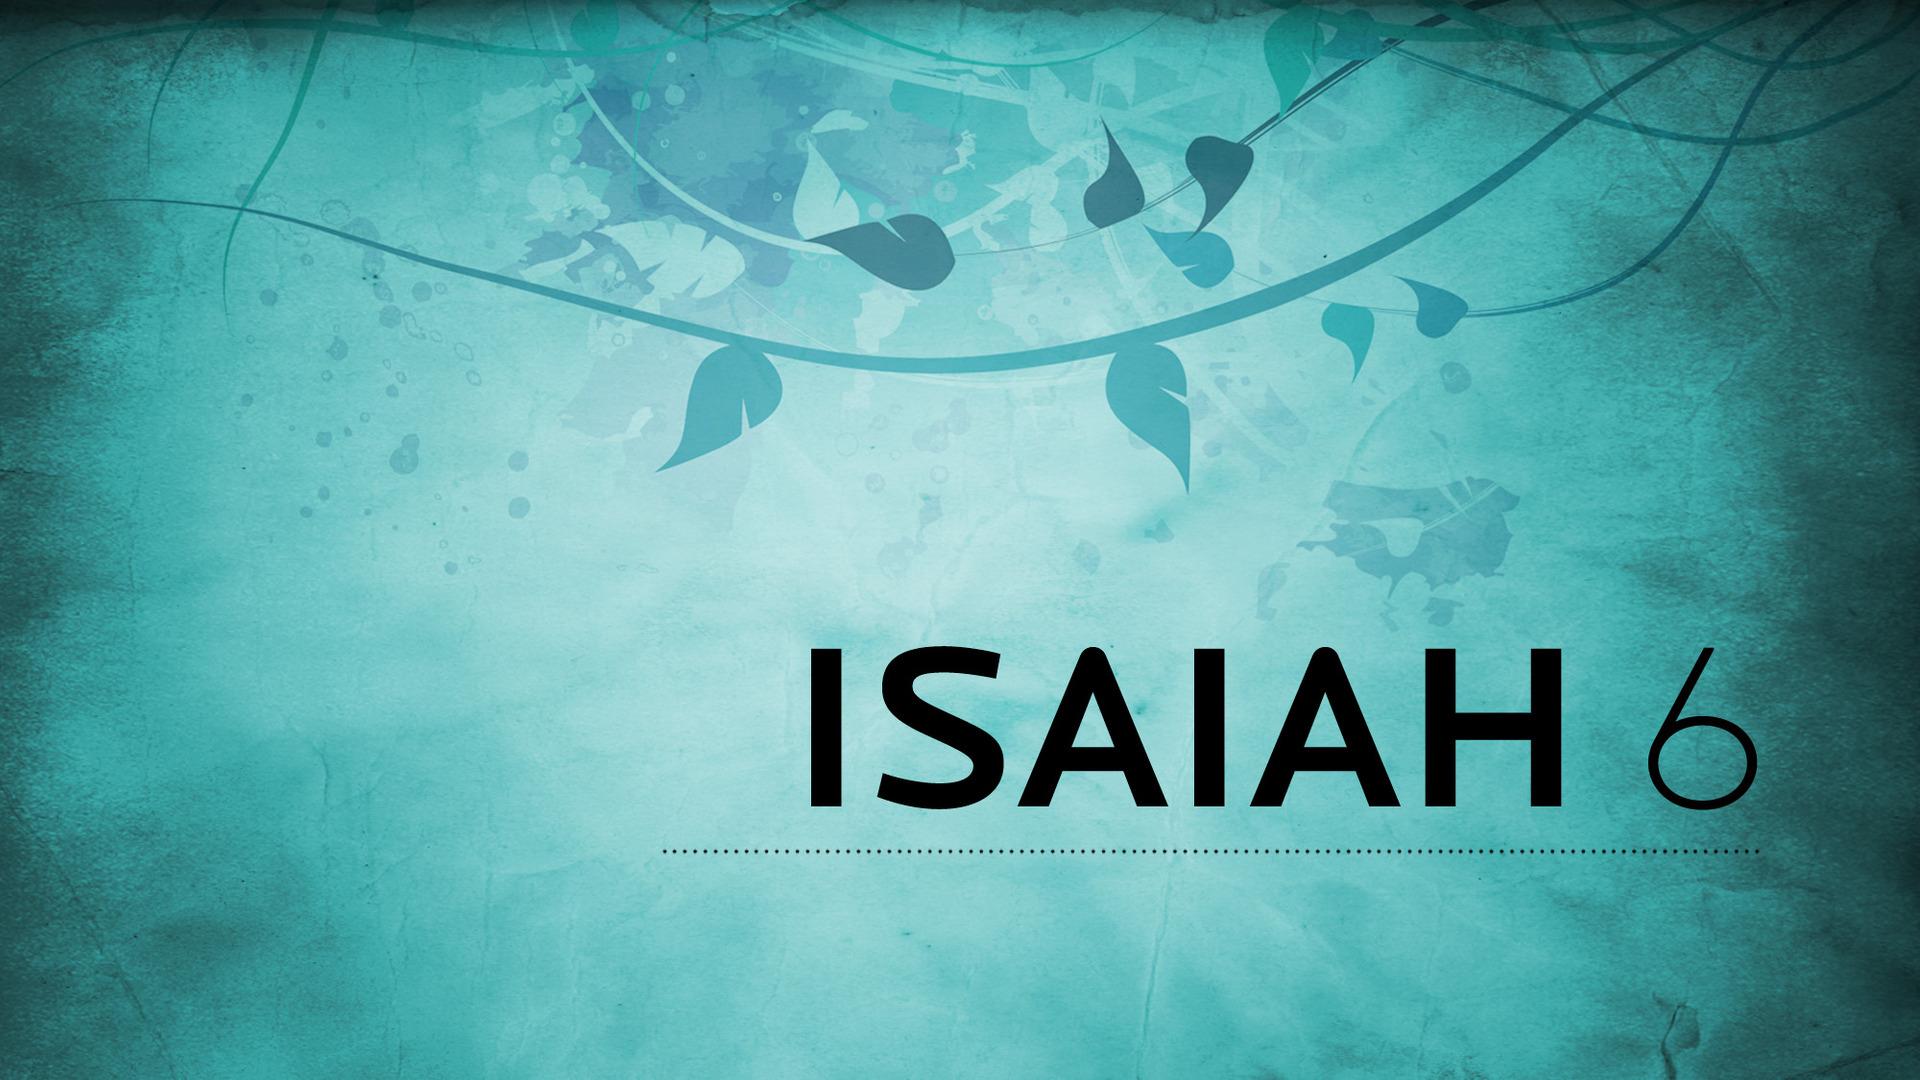 Isaiah 6